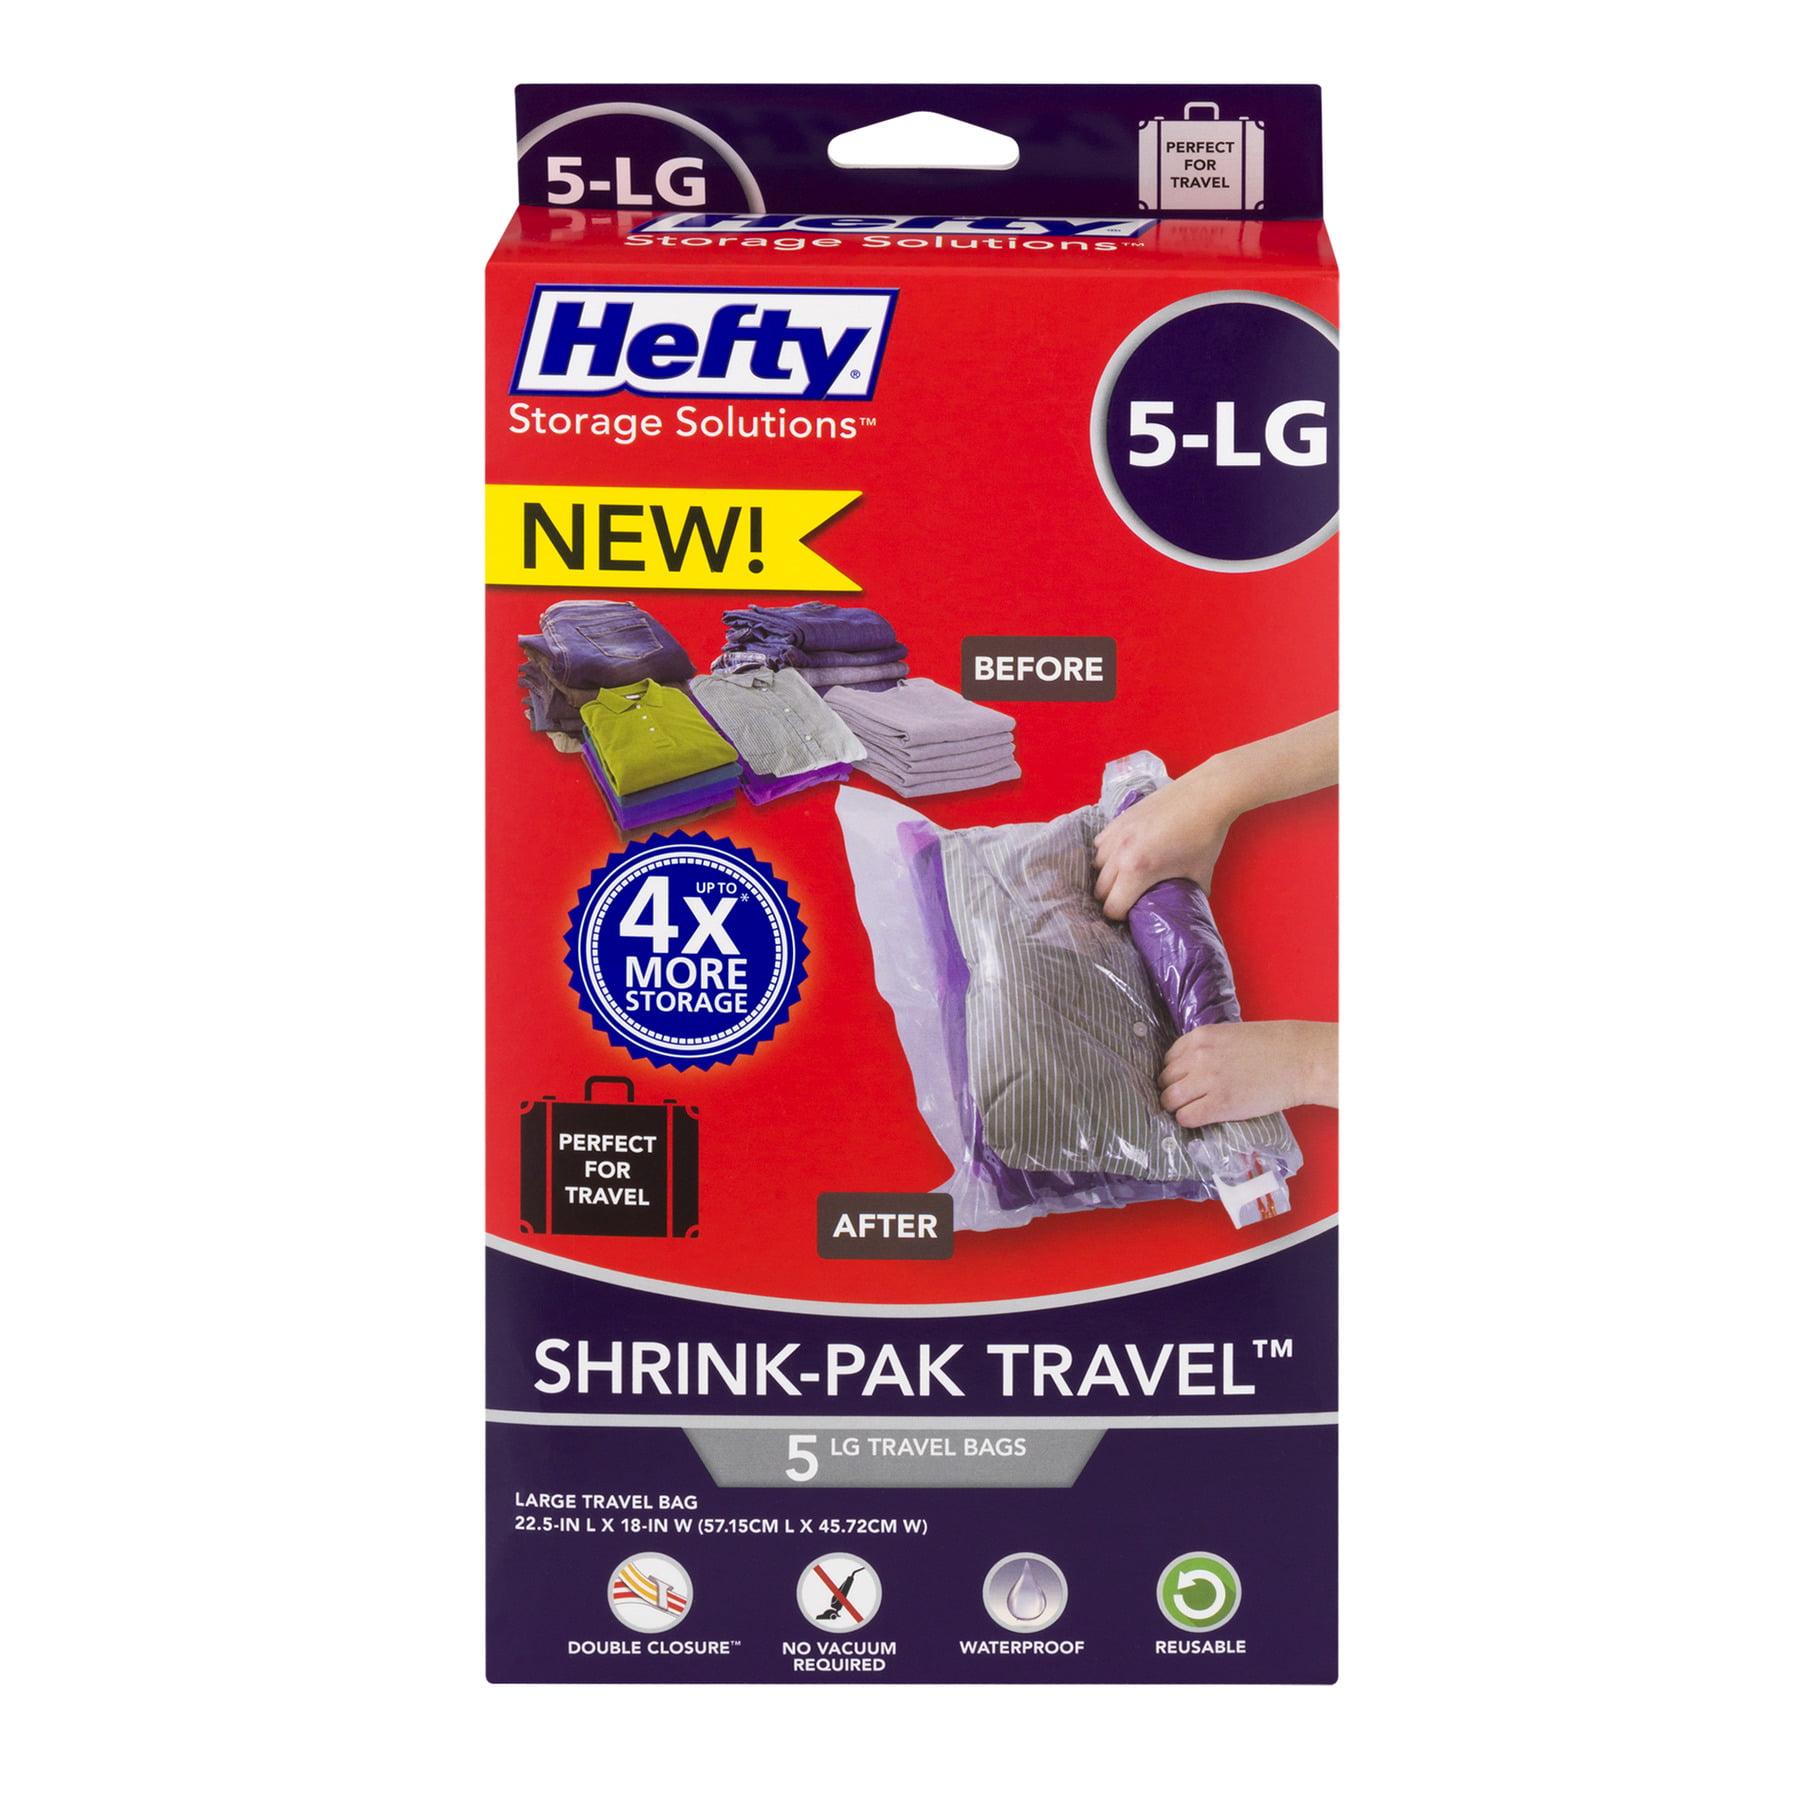 Hefty Storage Solutions Shrink-Pak-Travel Bags Large - 5 CT